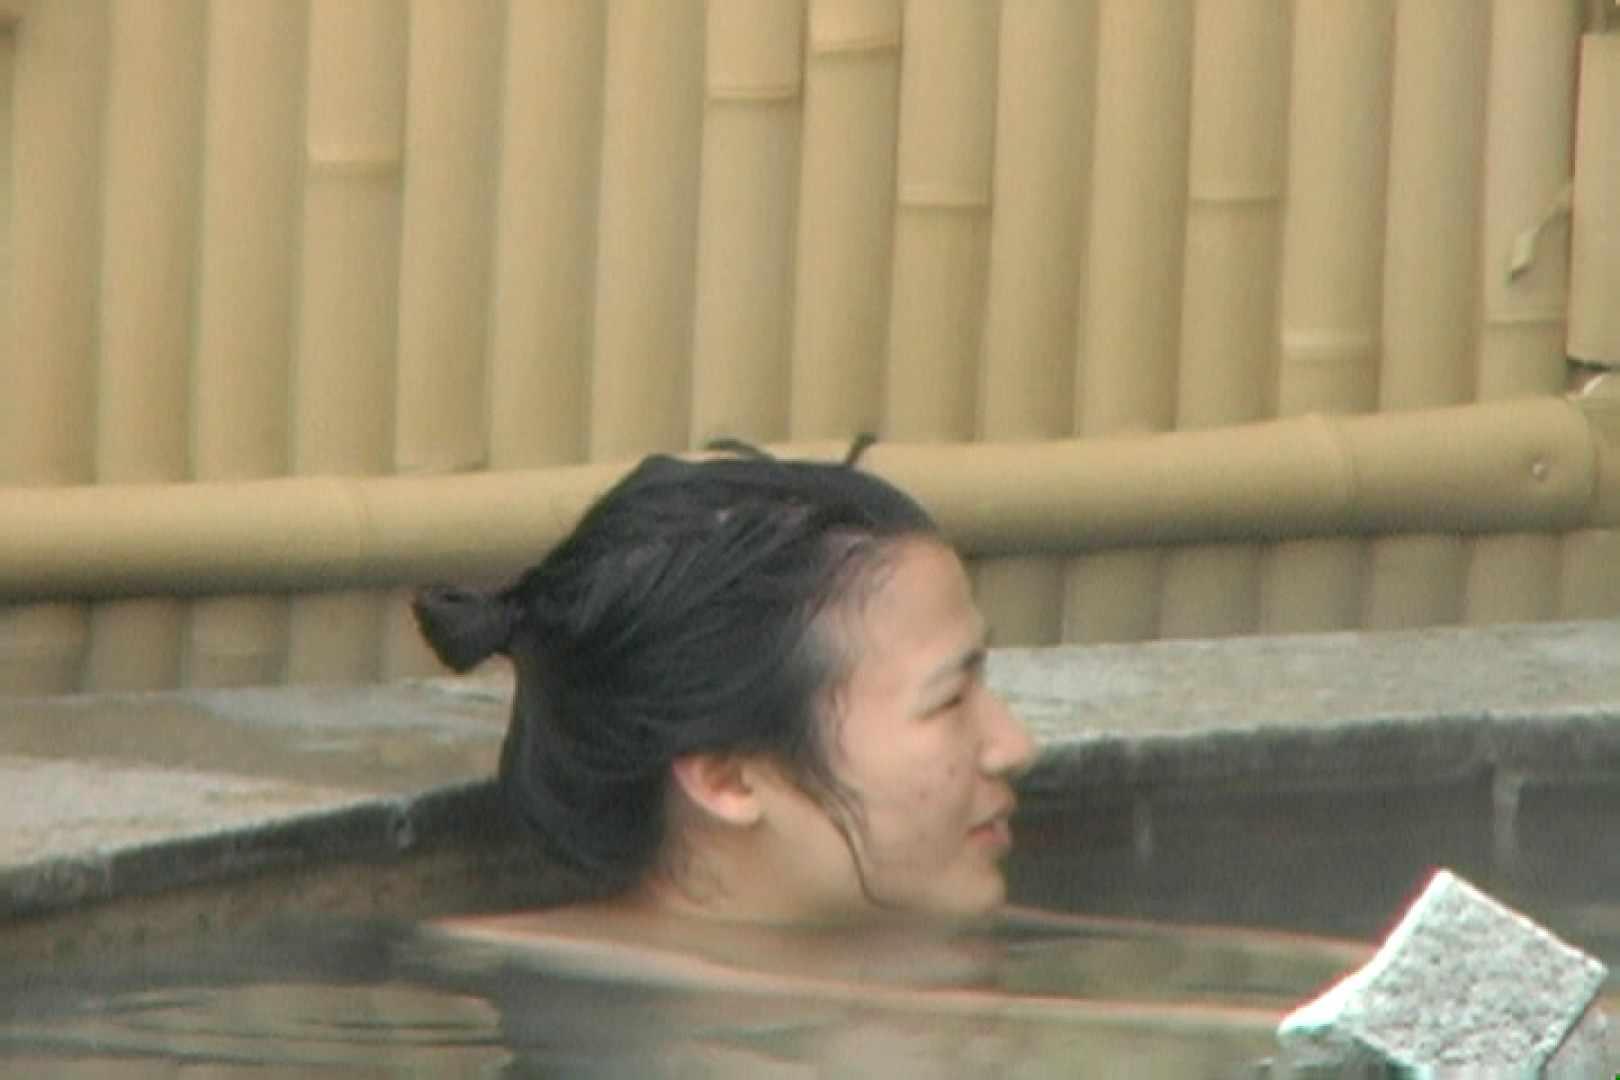 Aquaな露天風呂Vol.647 OLセックス 盗撮戯れ無修正画像 83画像 71